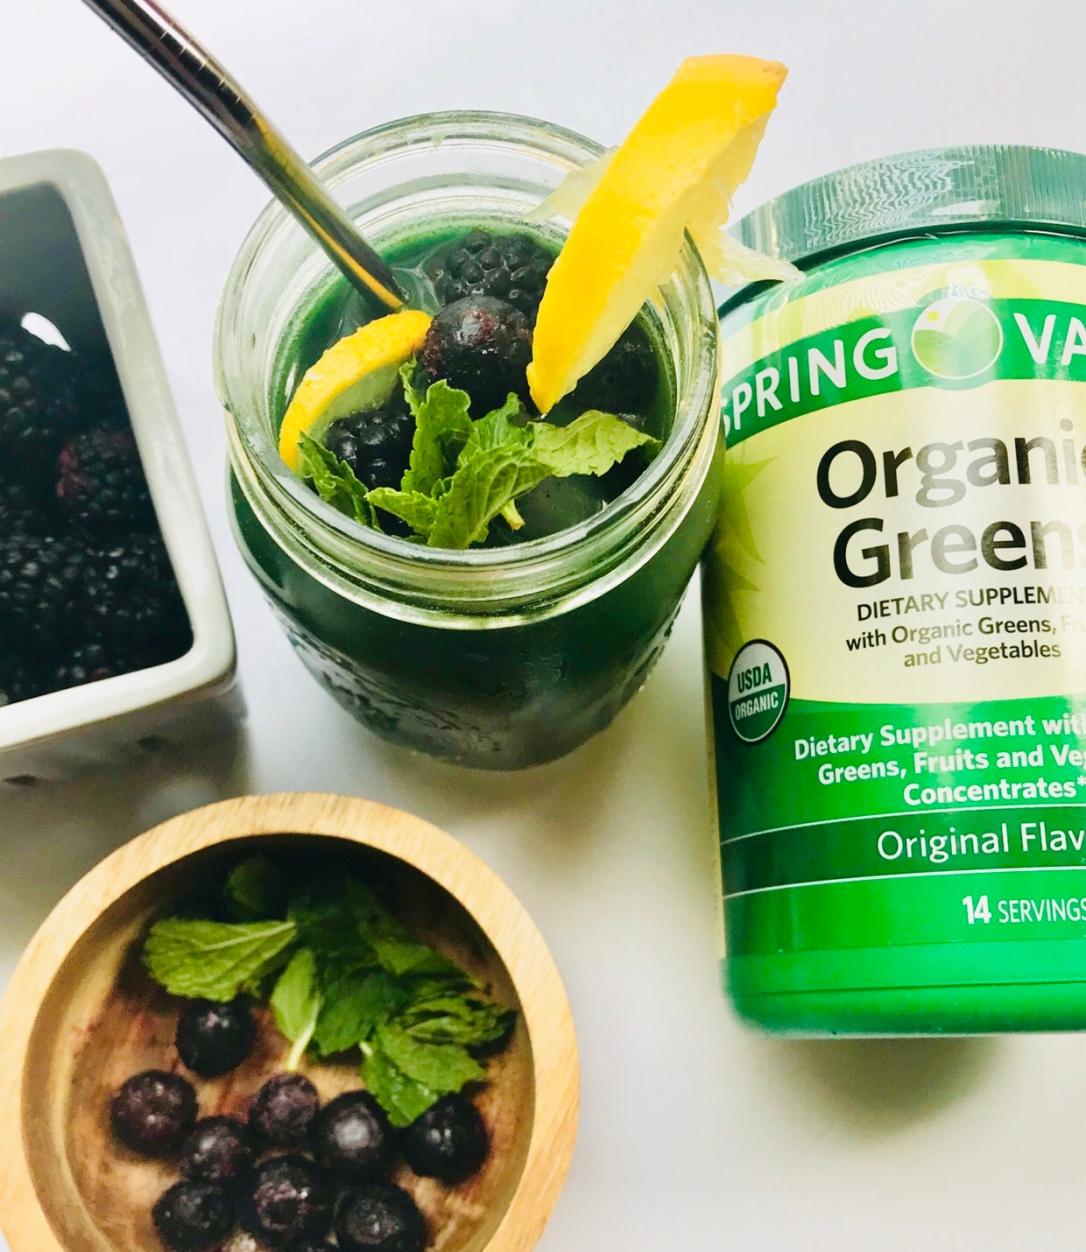 Vitamin Water Daily Greens Detox Drink